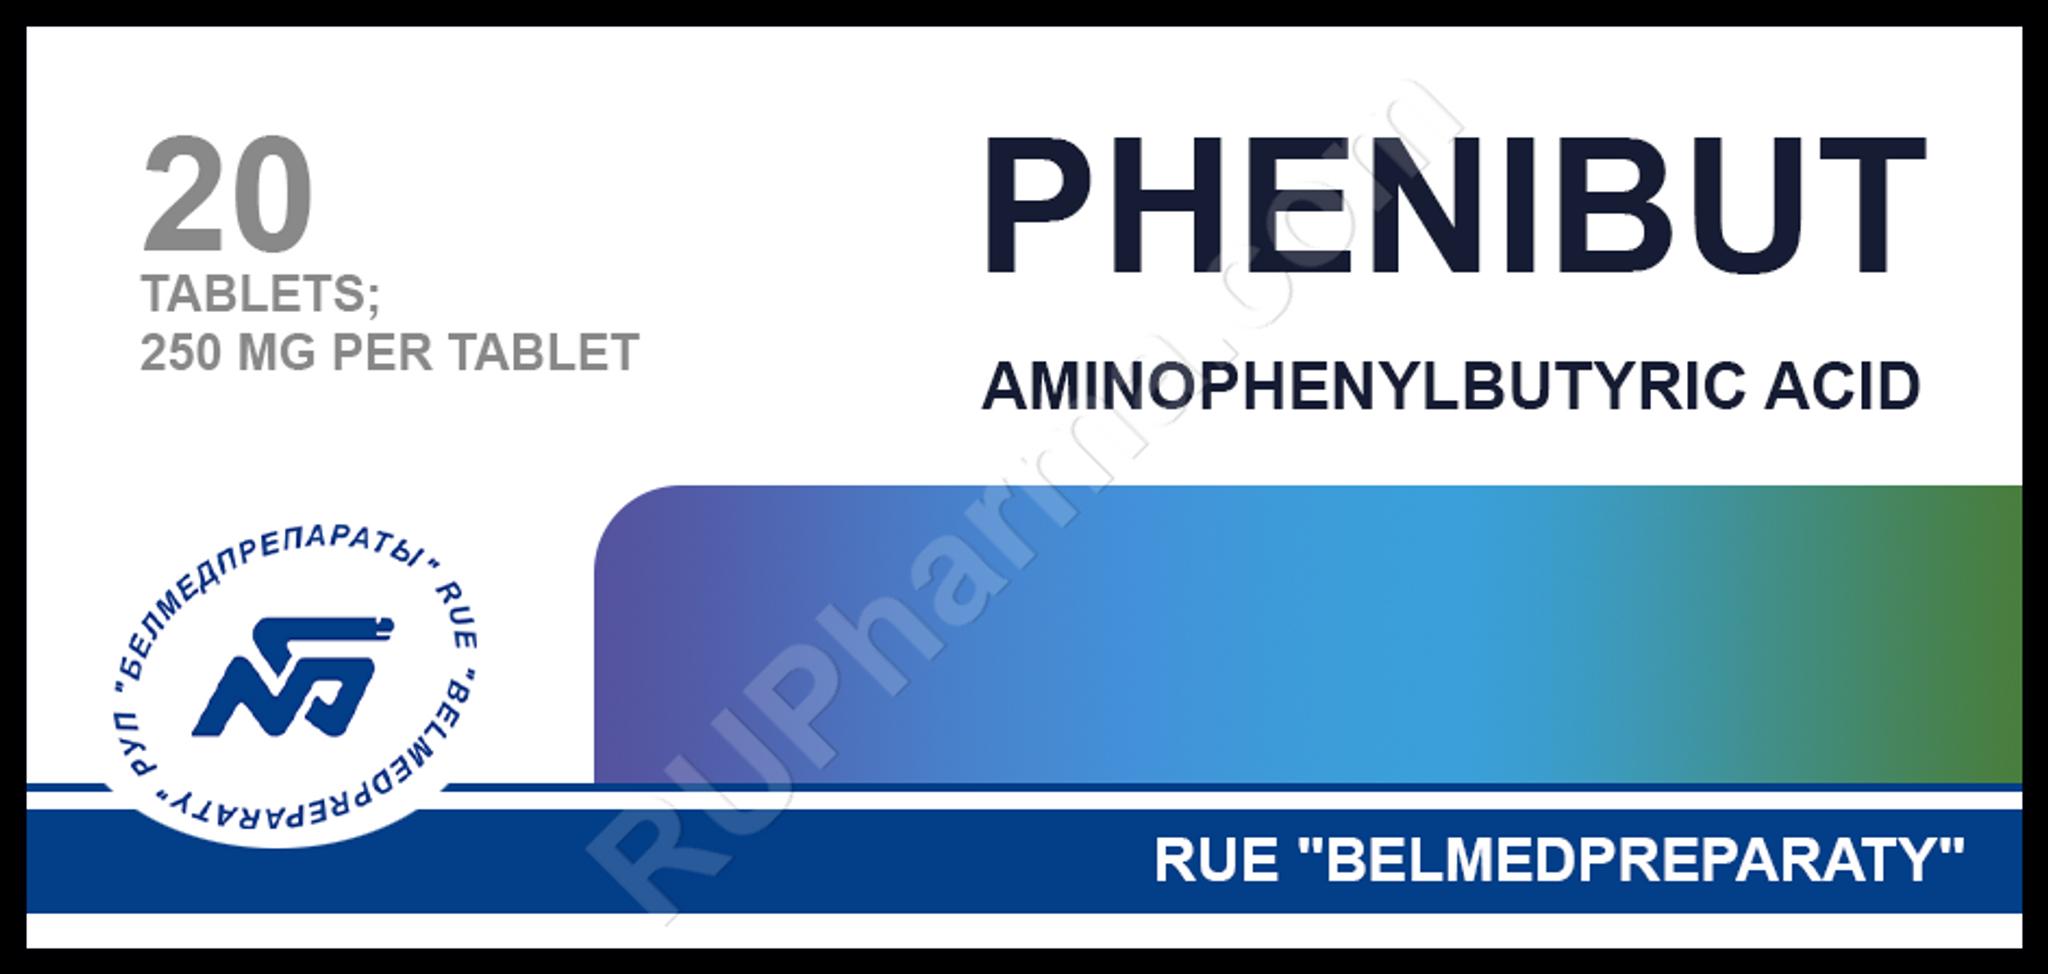 PHENIBUT® (Phenibut-R, Fenibut, Phenybut) 250 mg/tab, 20 tabs